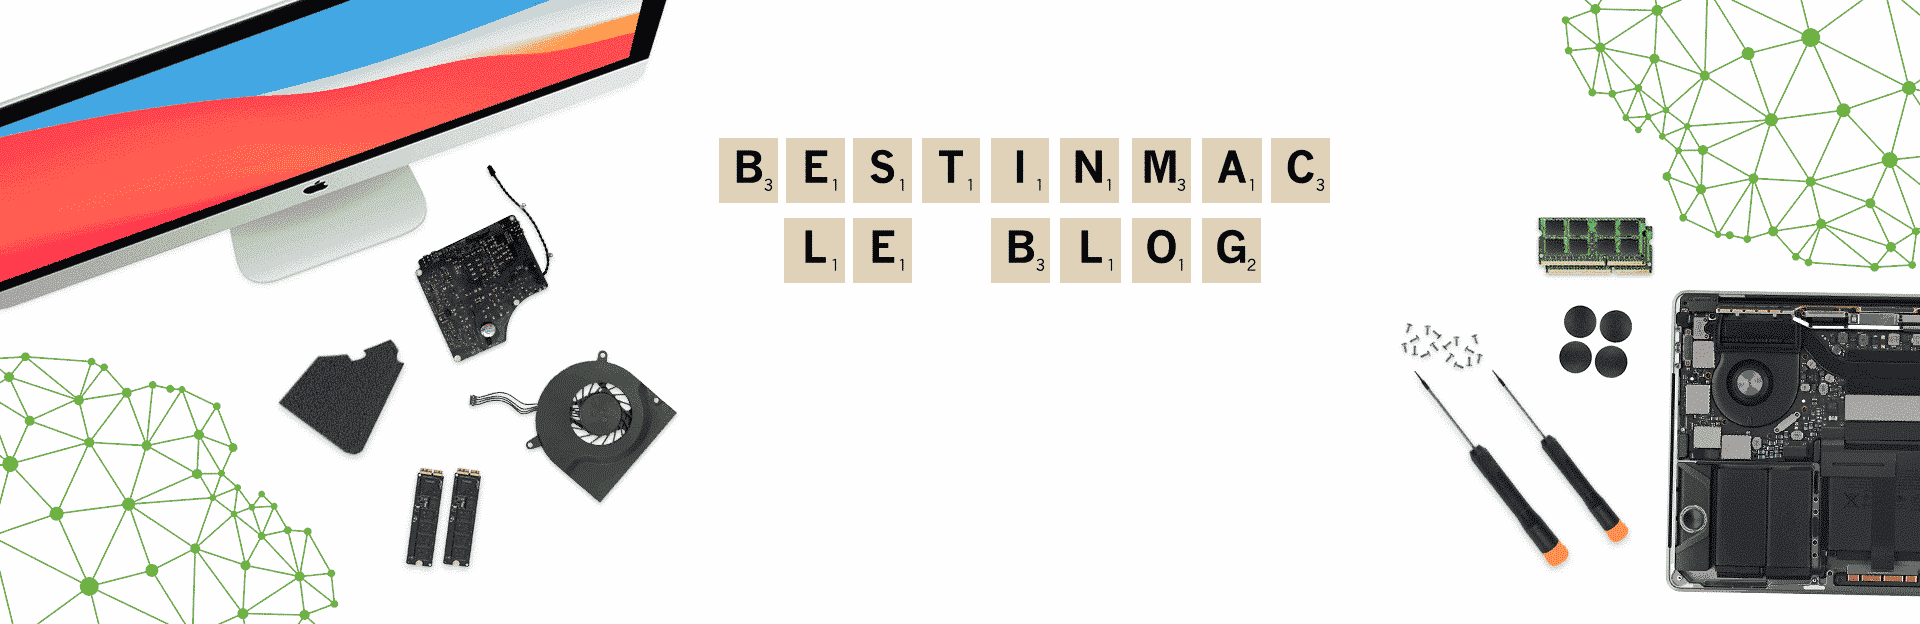 Bienvenue sur le Blog BestinMac.com